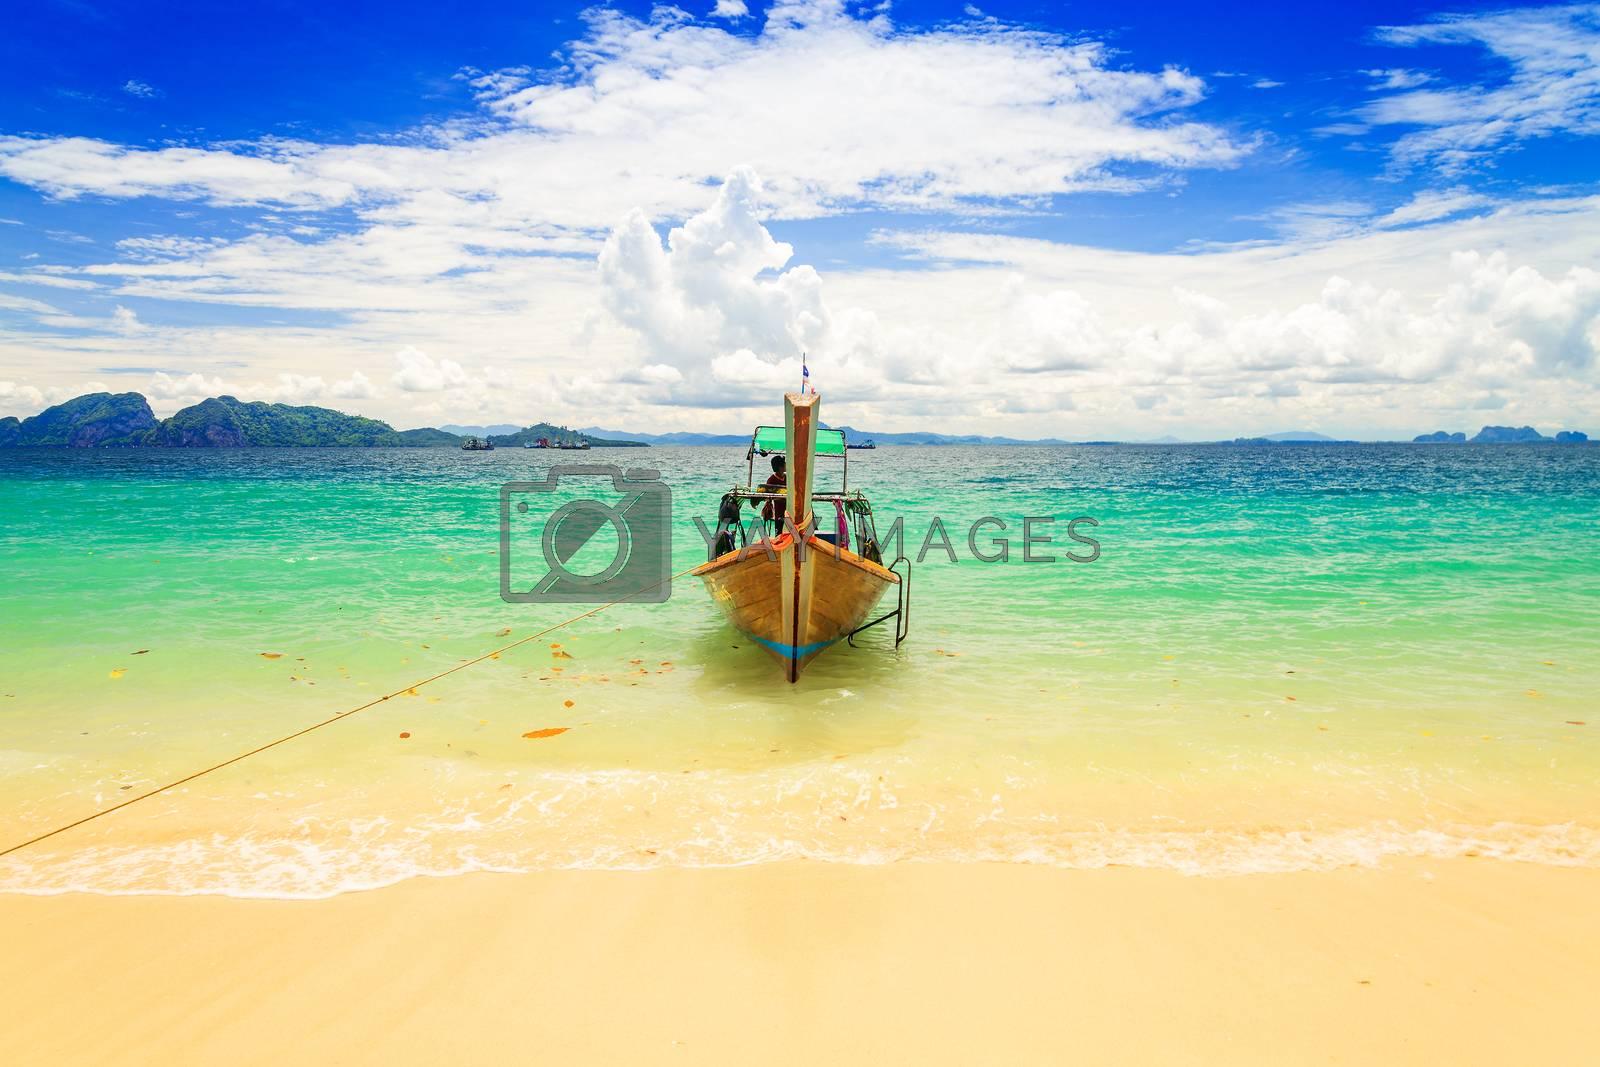 Long tailed boat at Kradan island, Thailand by jakgree